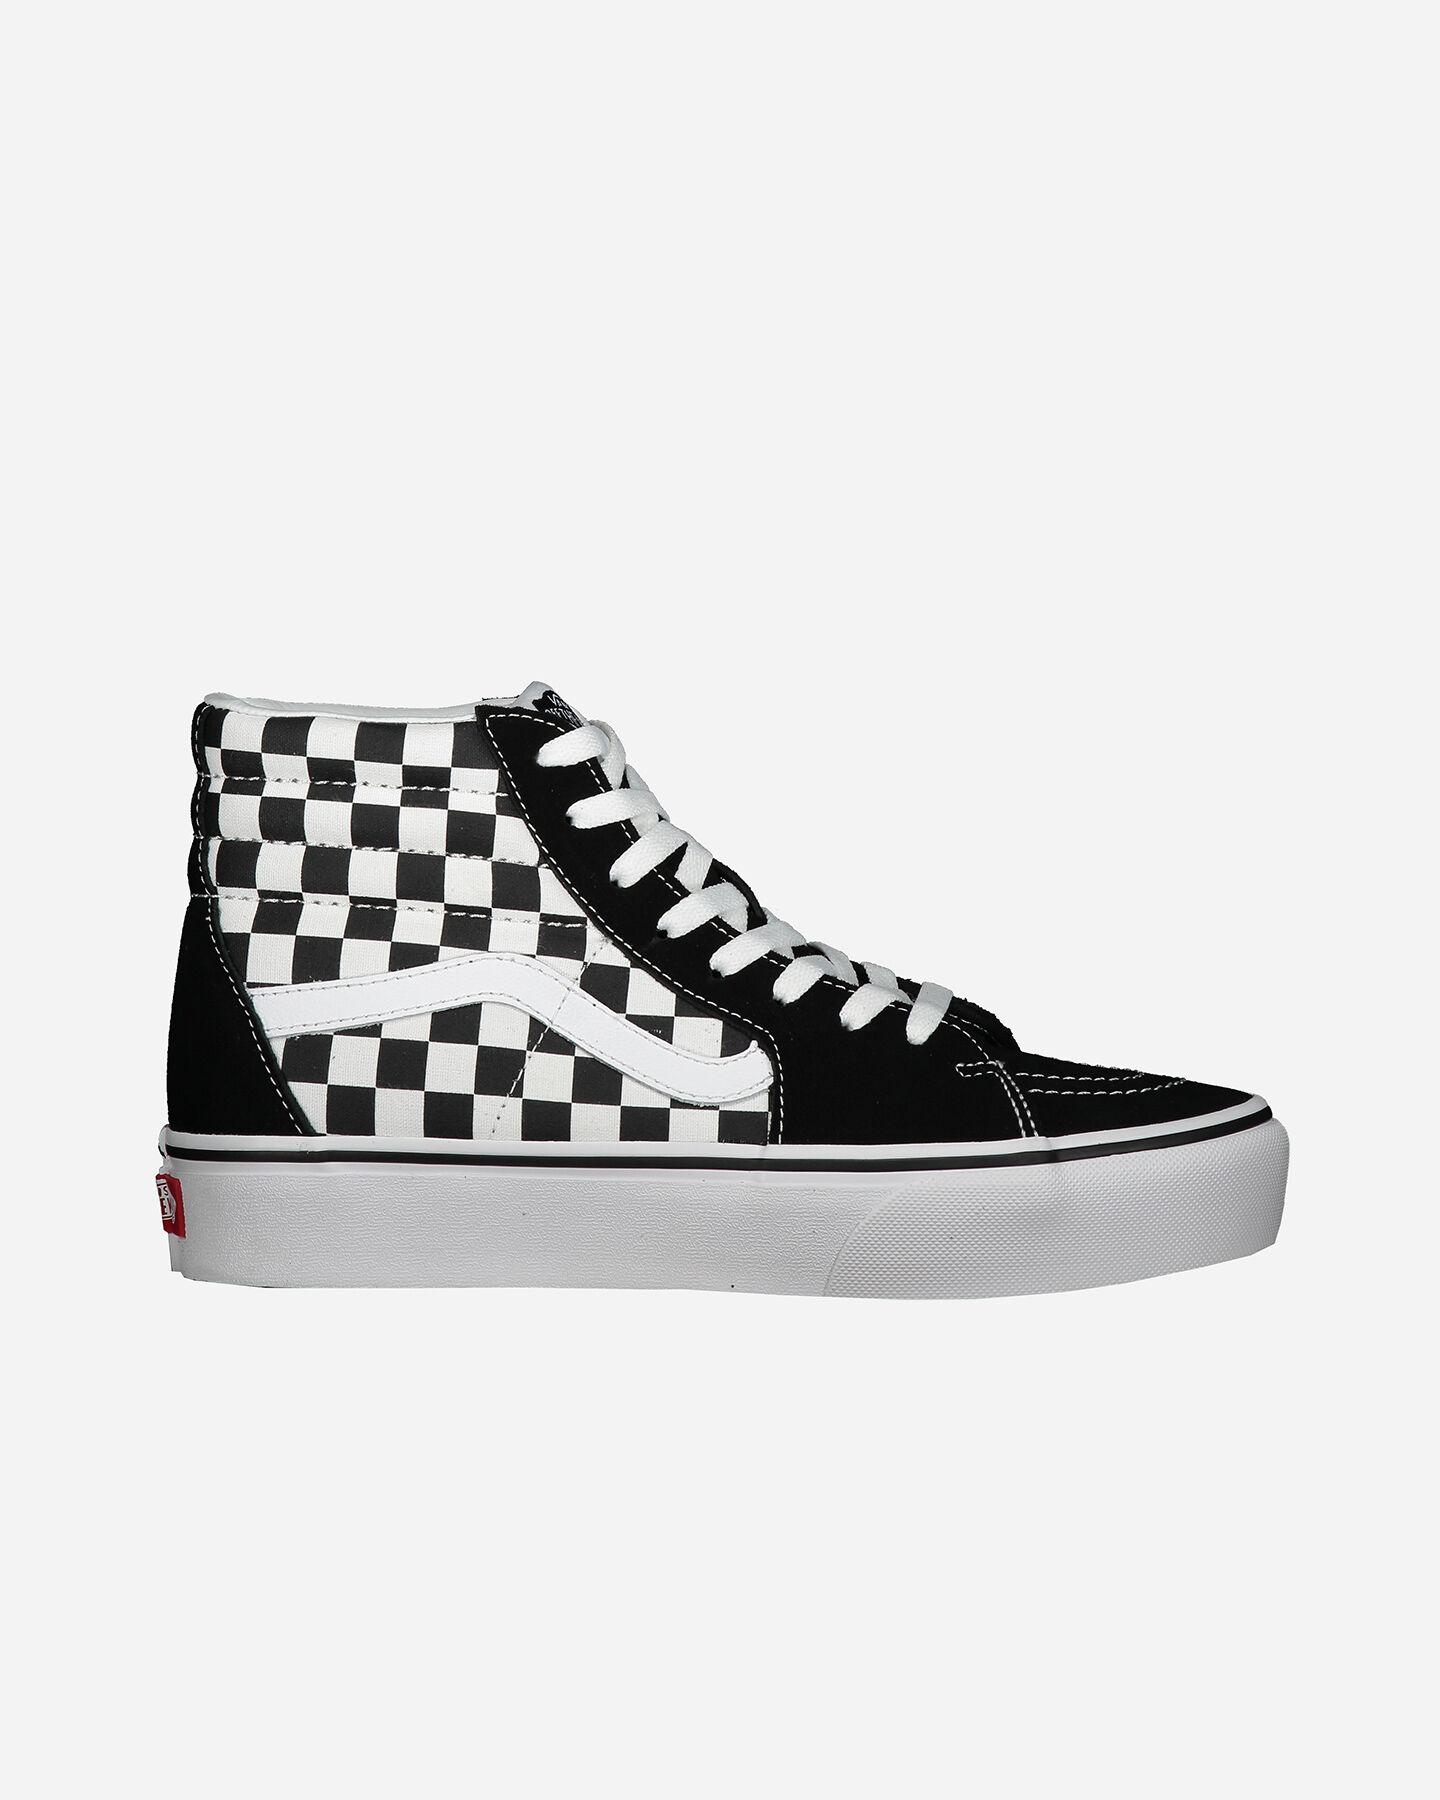 Scarpe sneakers VANS SK8-HI PLATFORM 2.0  W S4053273 scatto 0